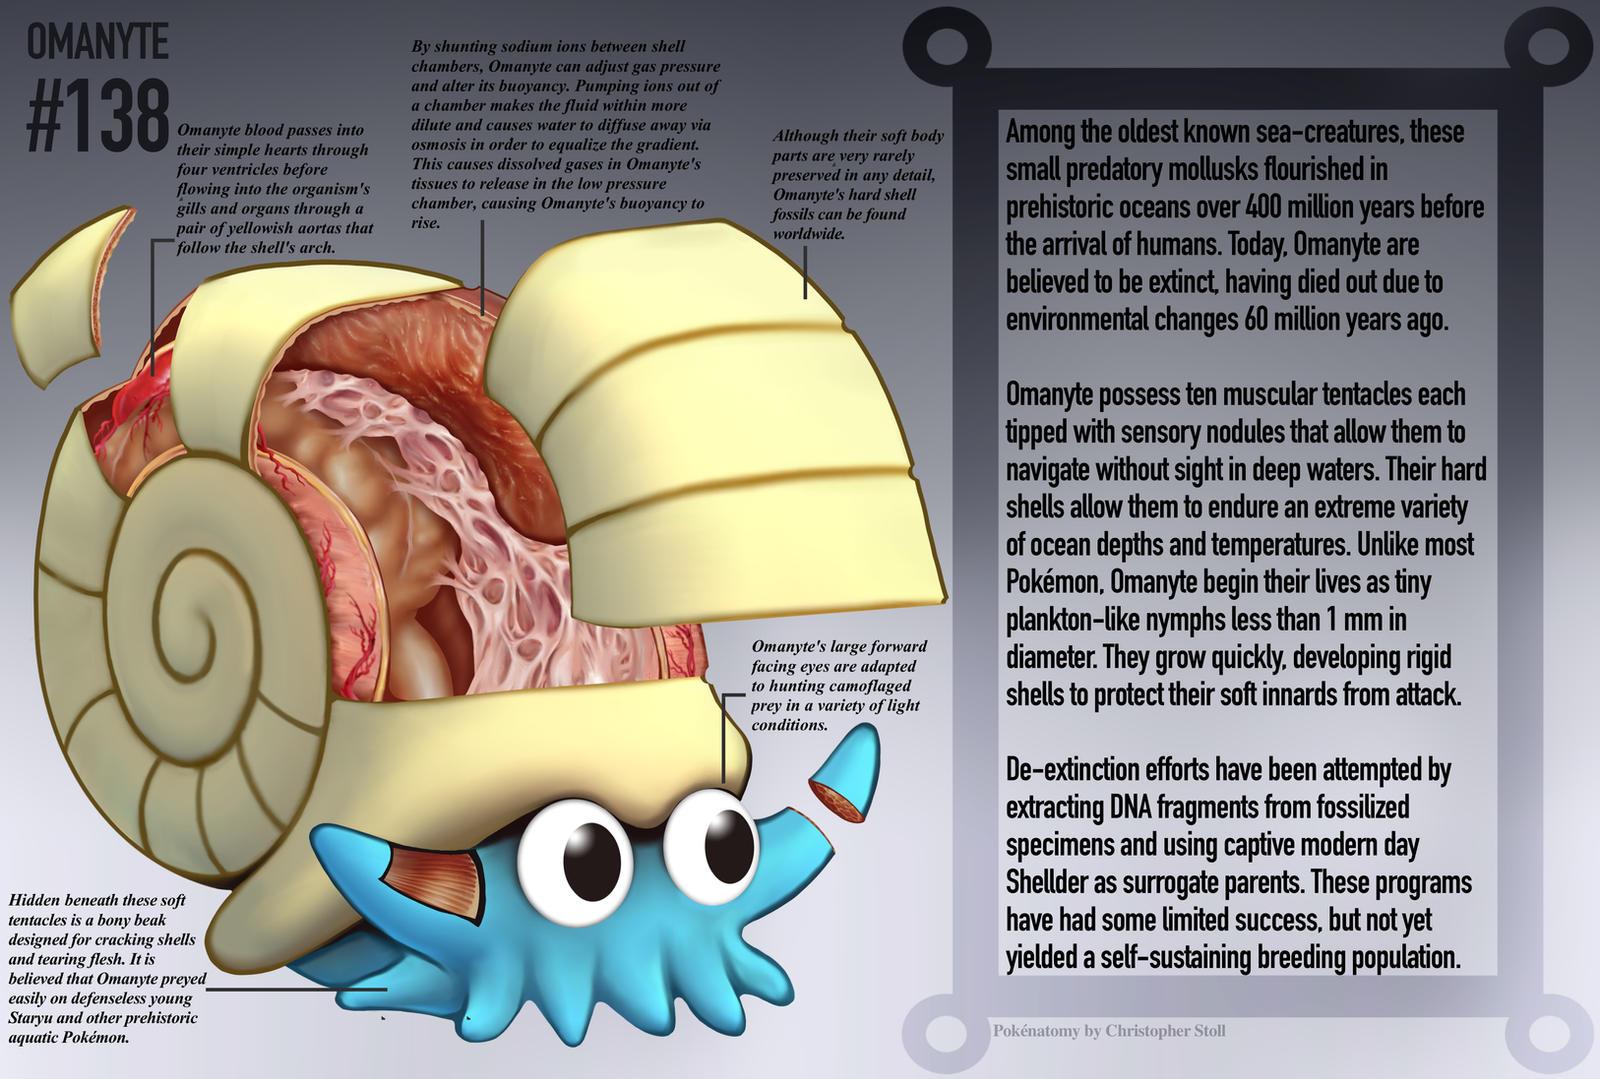 Pokemon Pokemon Anatomy Poster Images Pokemon Images